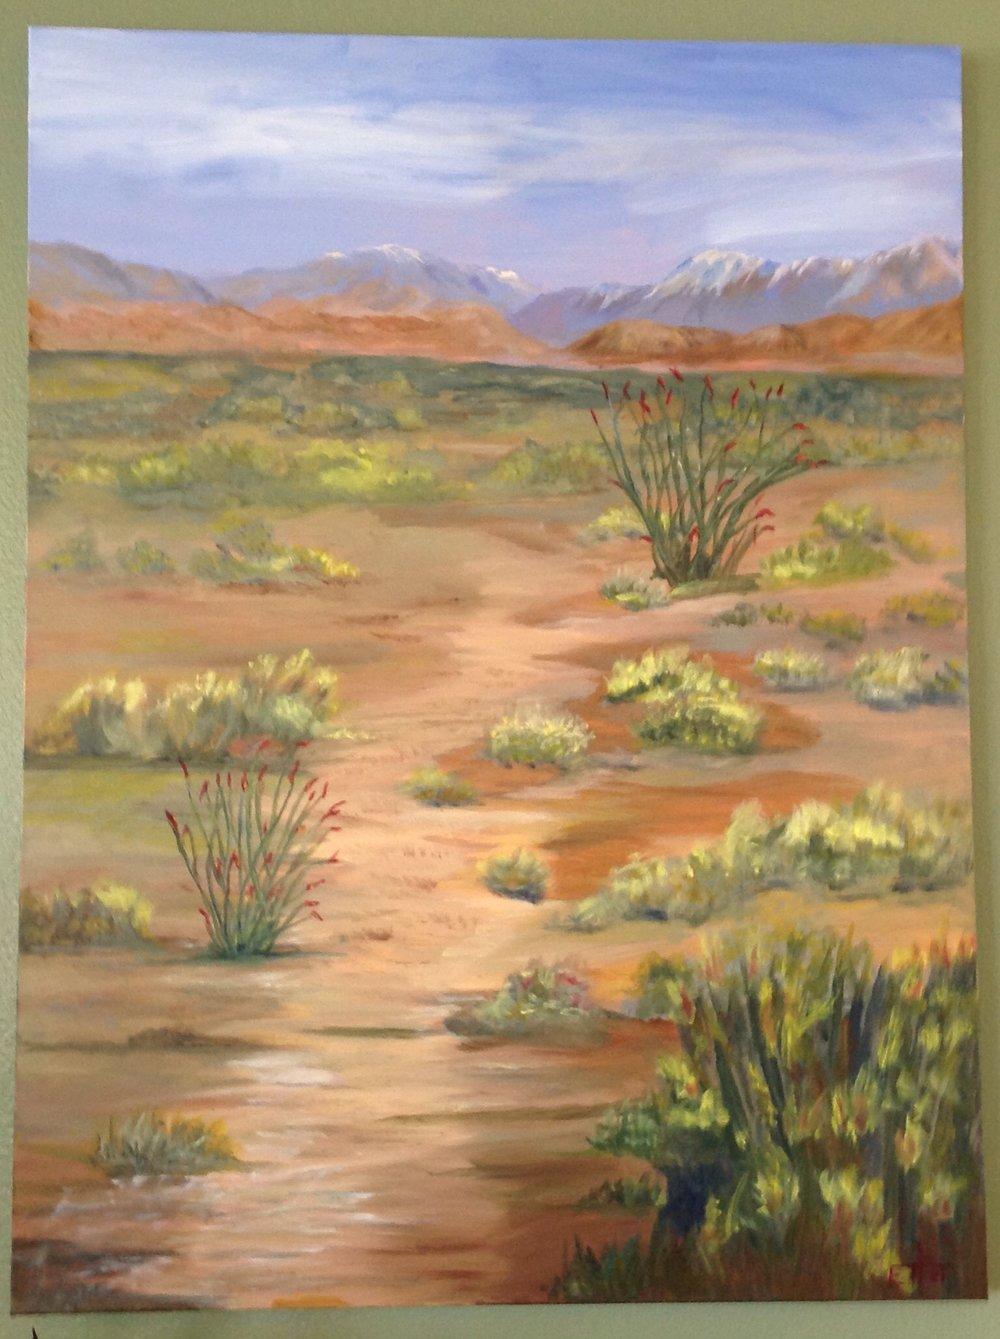 Desert View II